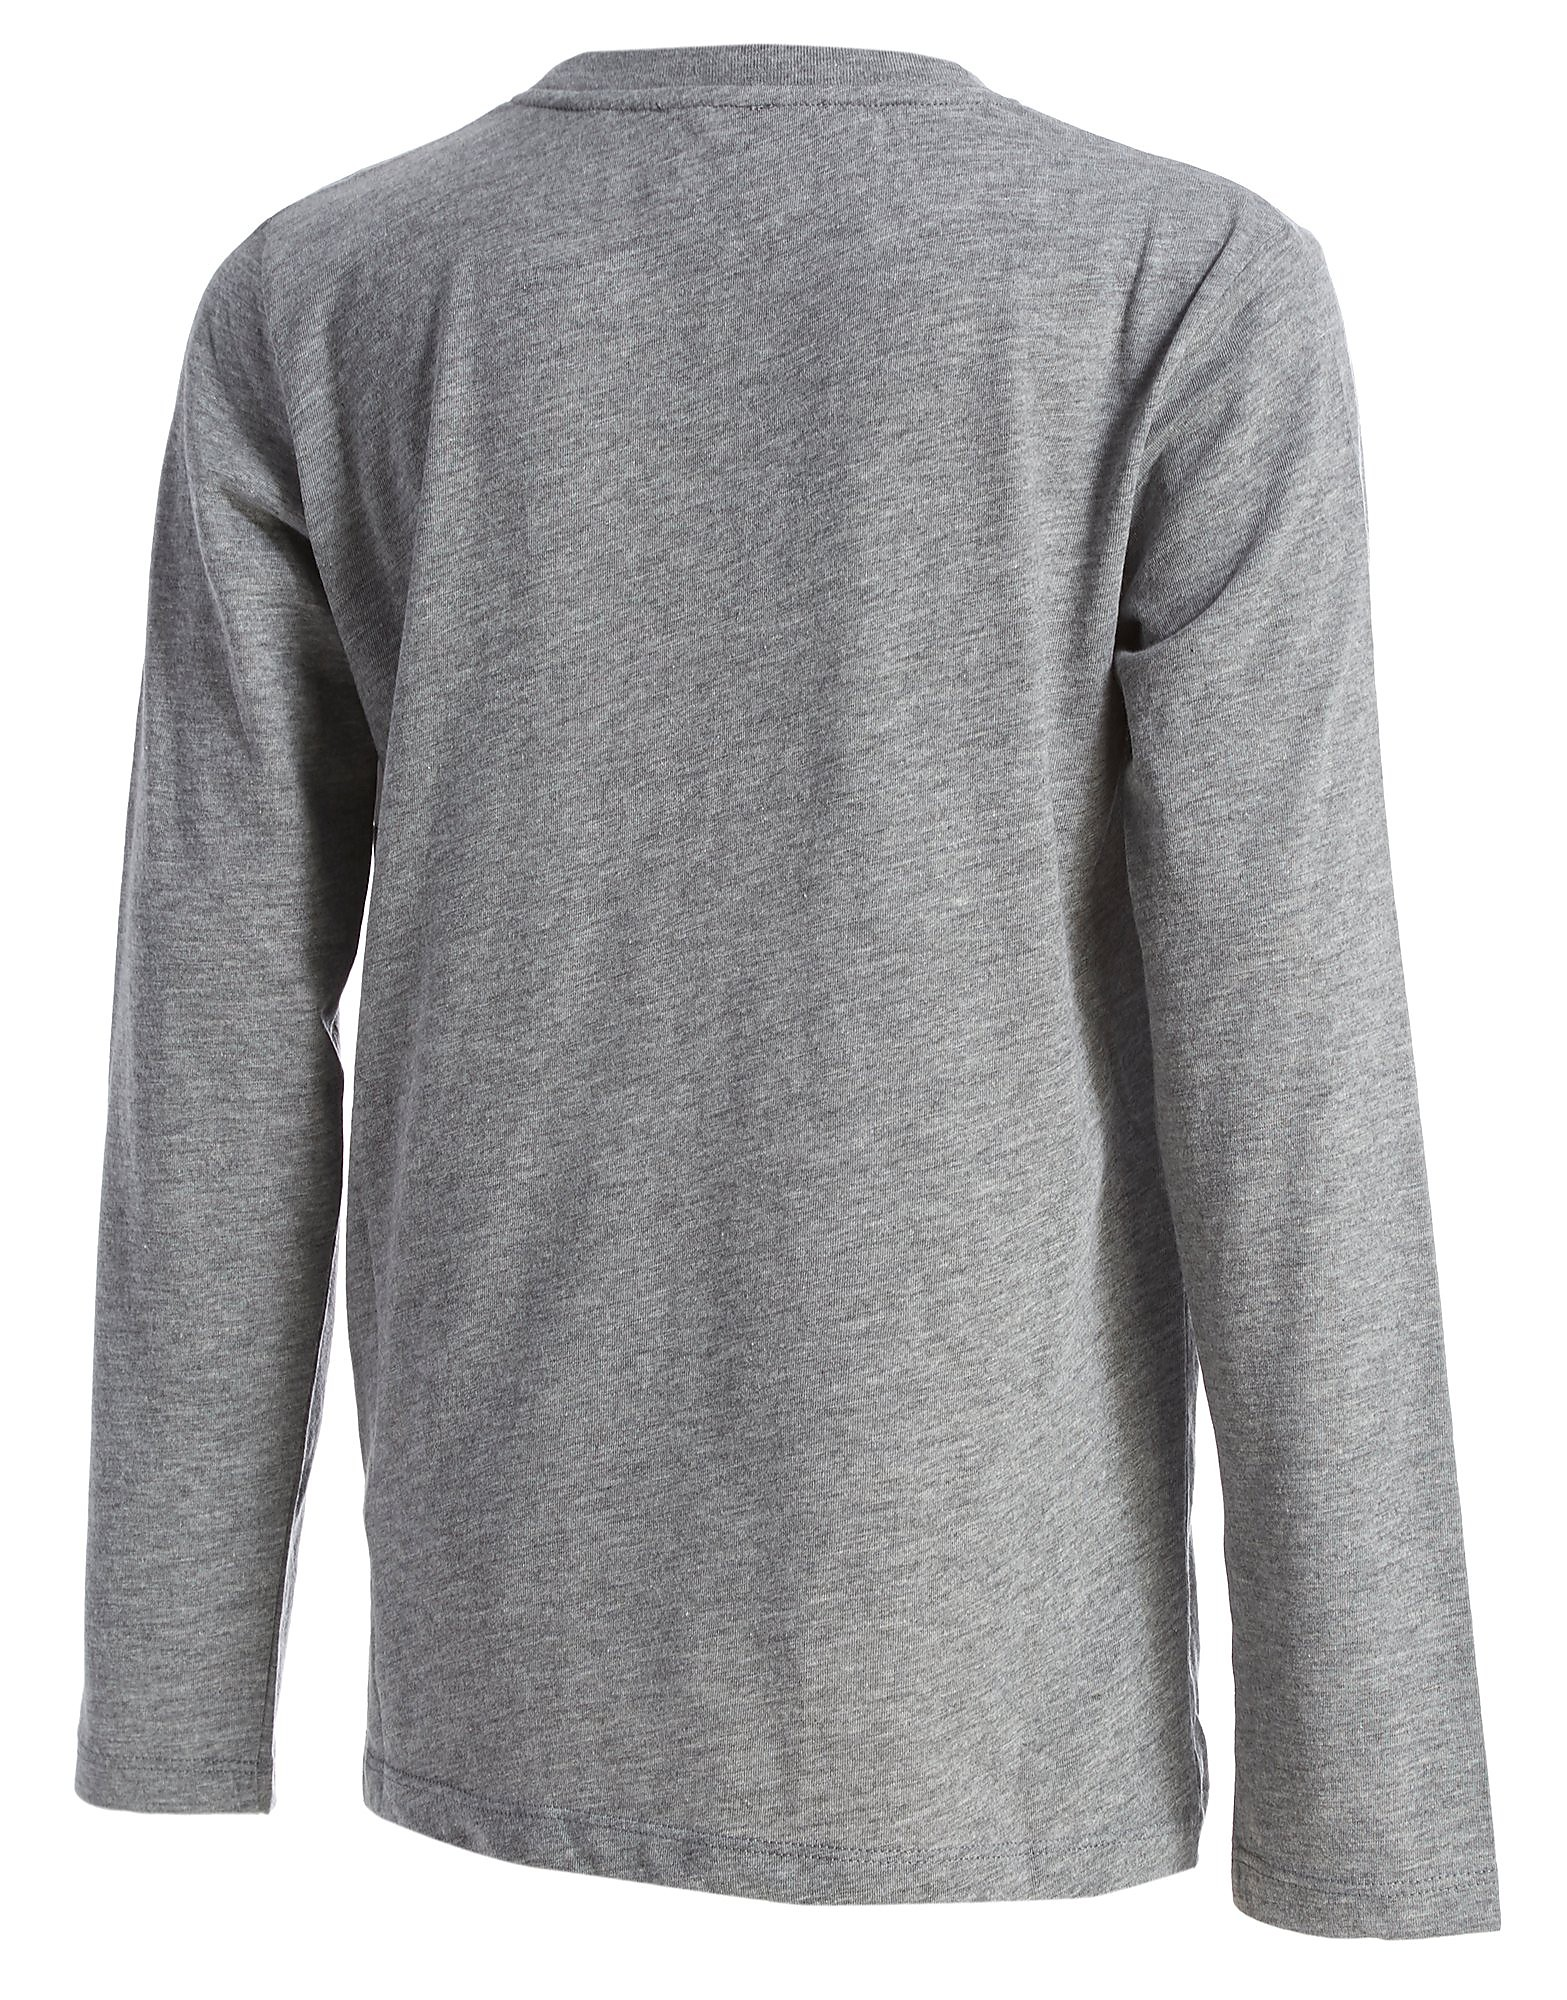 Emporio Armani EA7 Train Colourblock Long Sleeve T-Shirt Junior